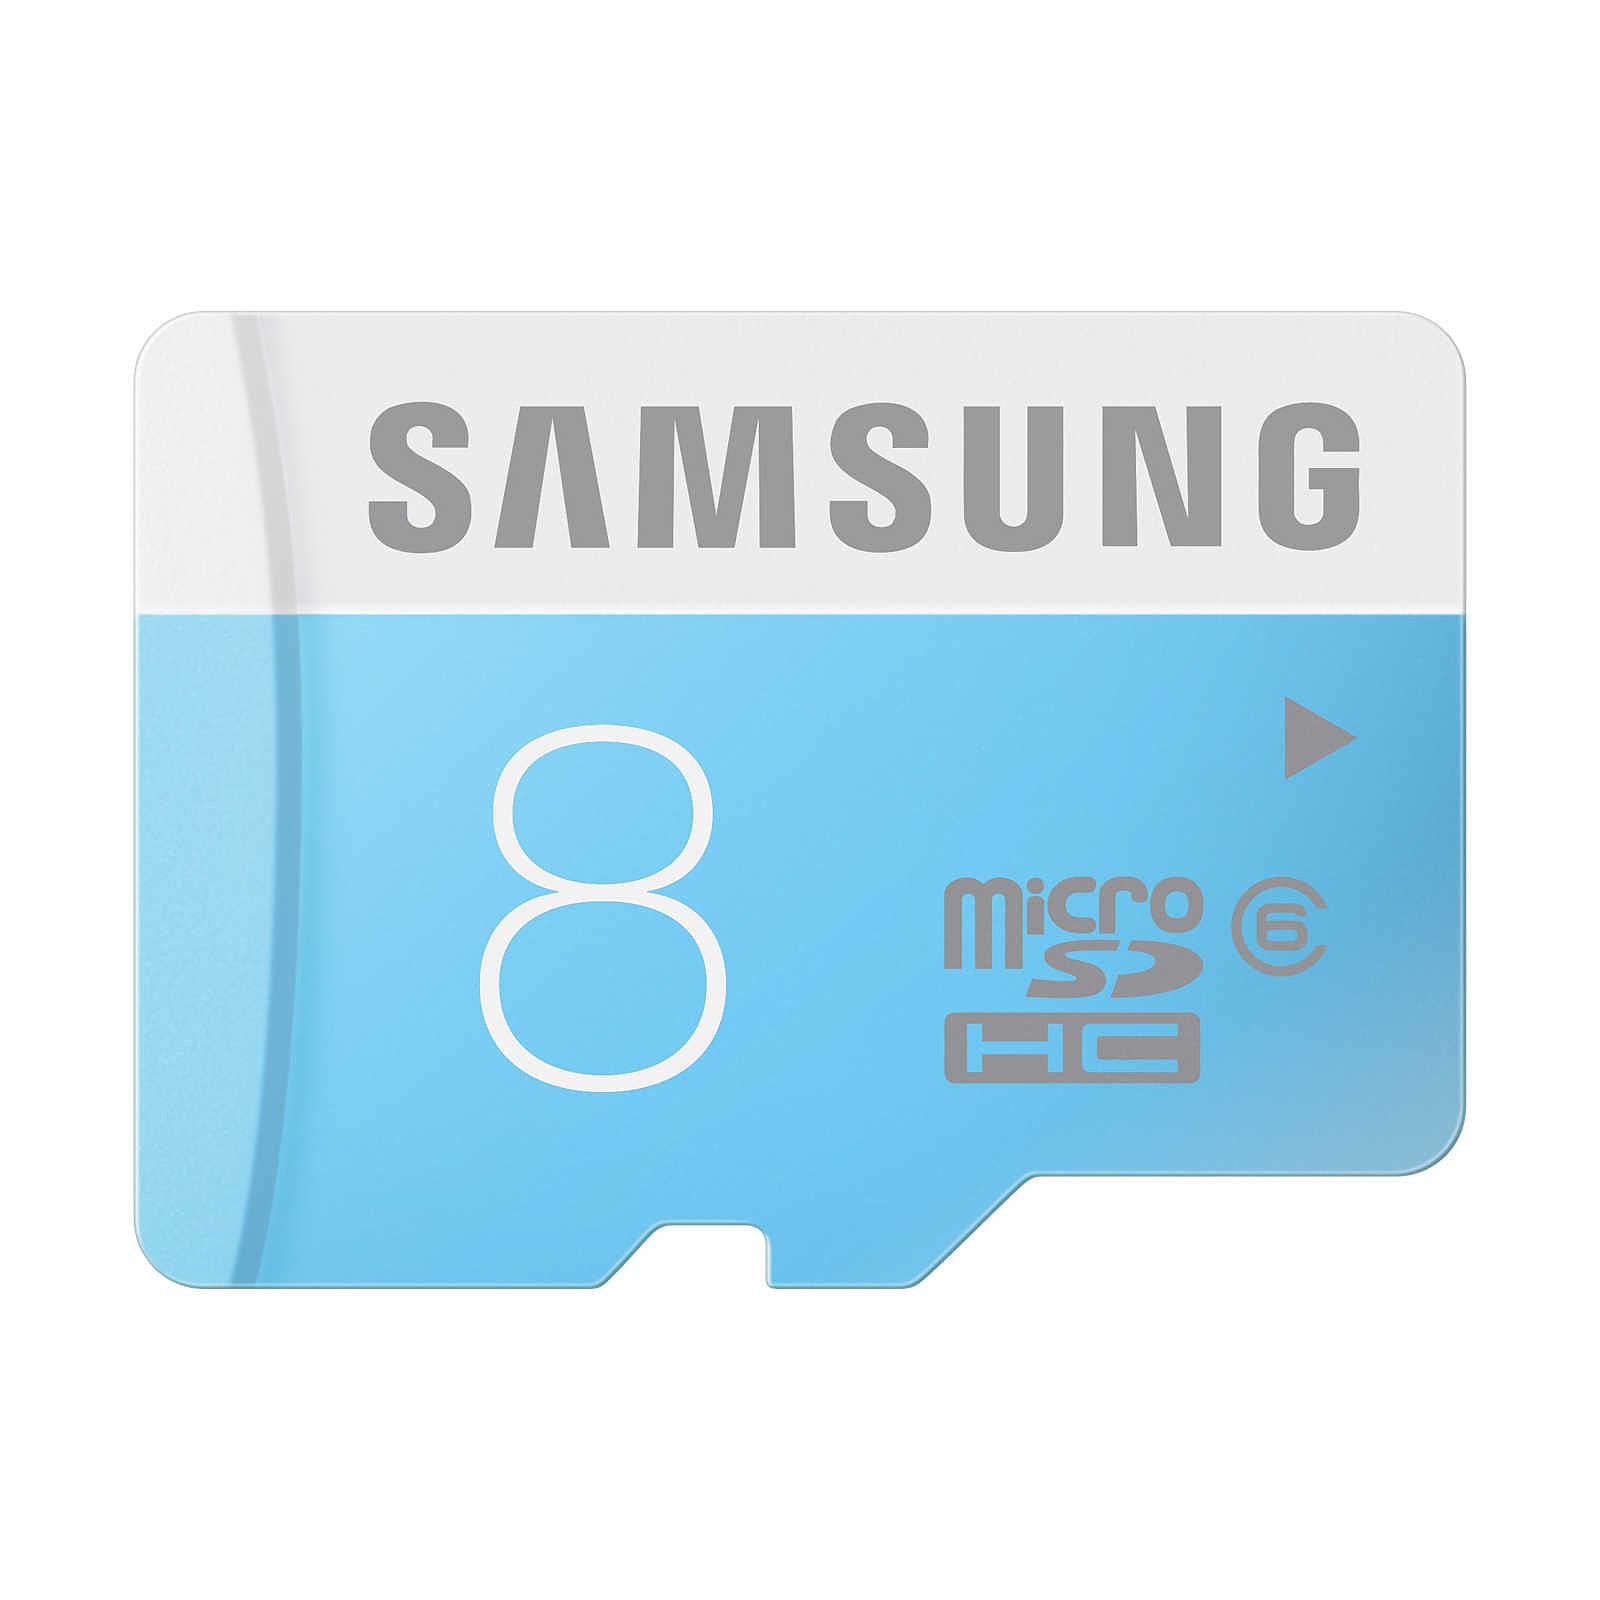 Samsung microSDHC 8 Go